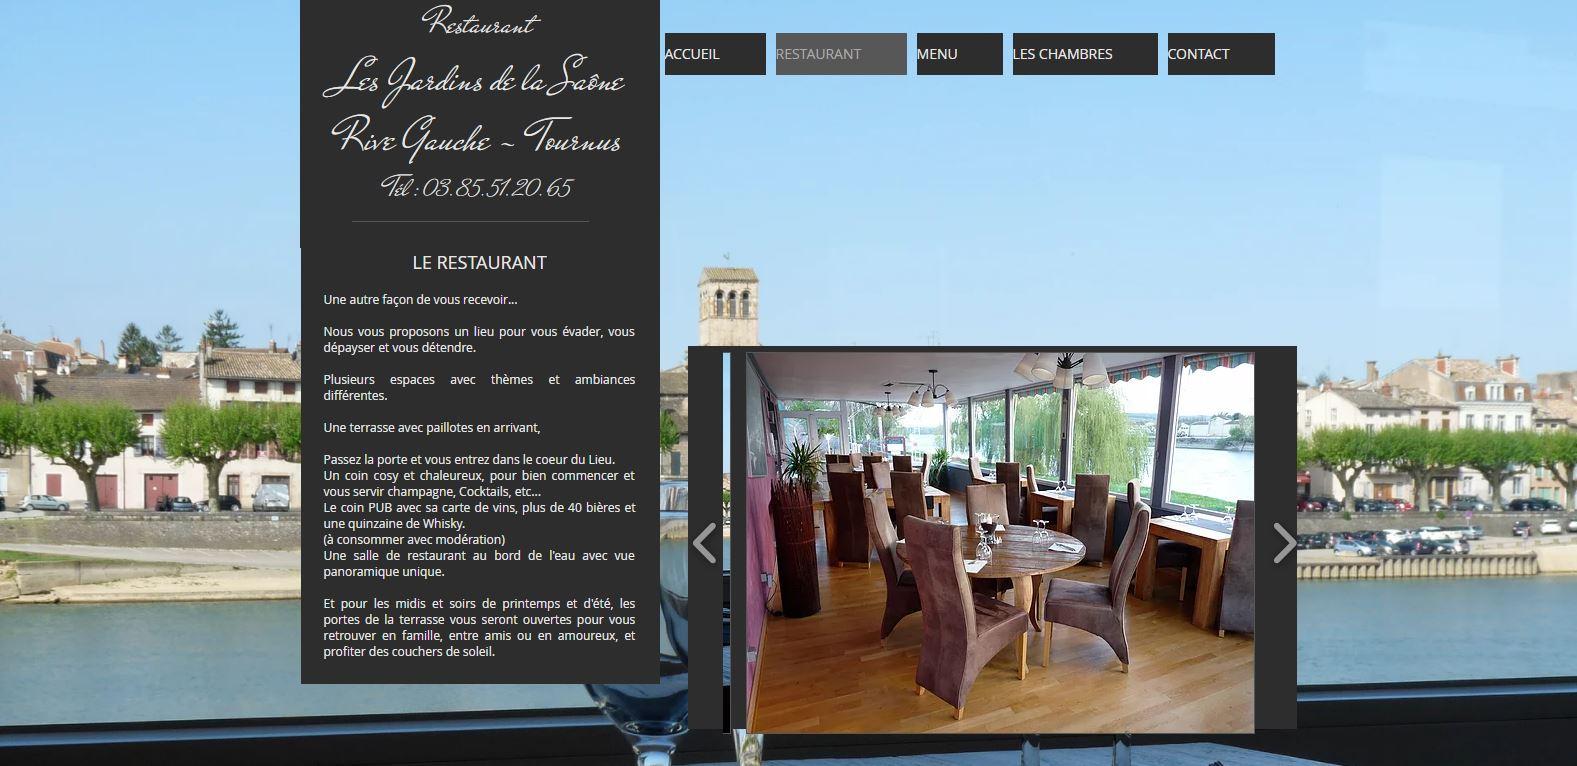 Restaurant Les jardins de la Saône in Tournus